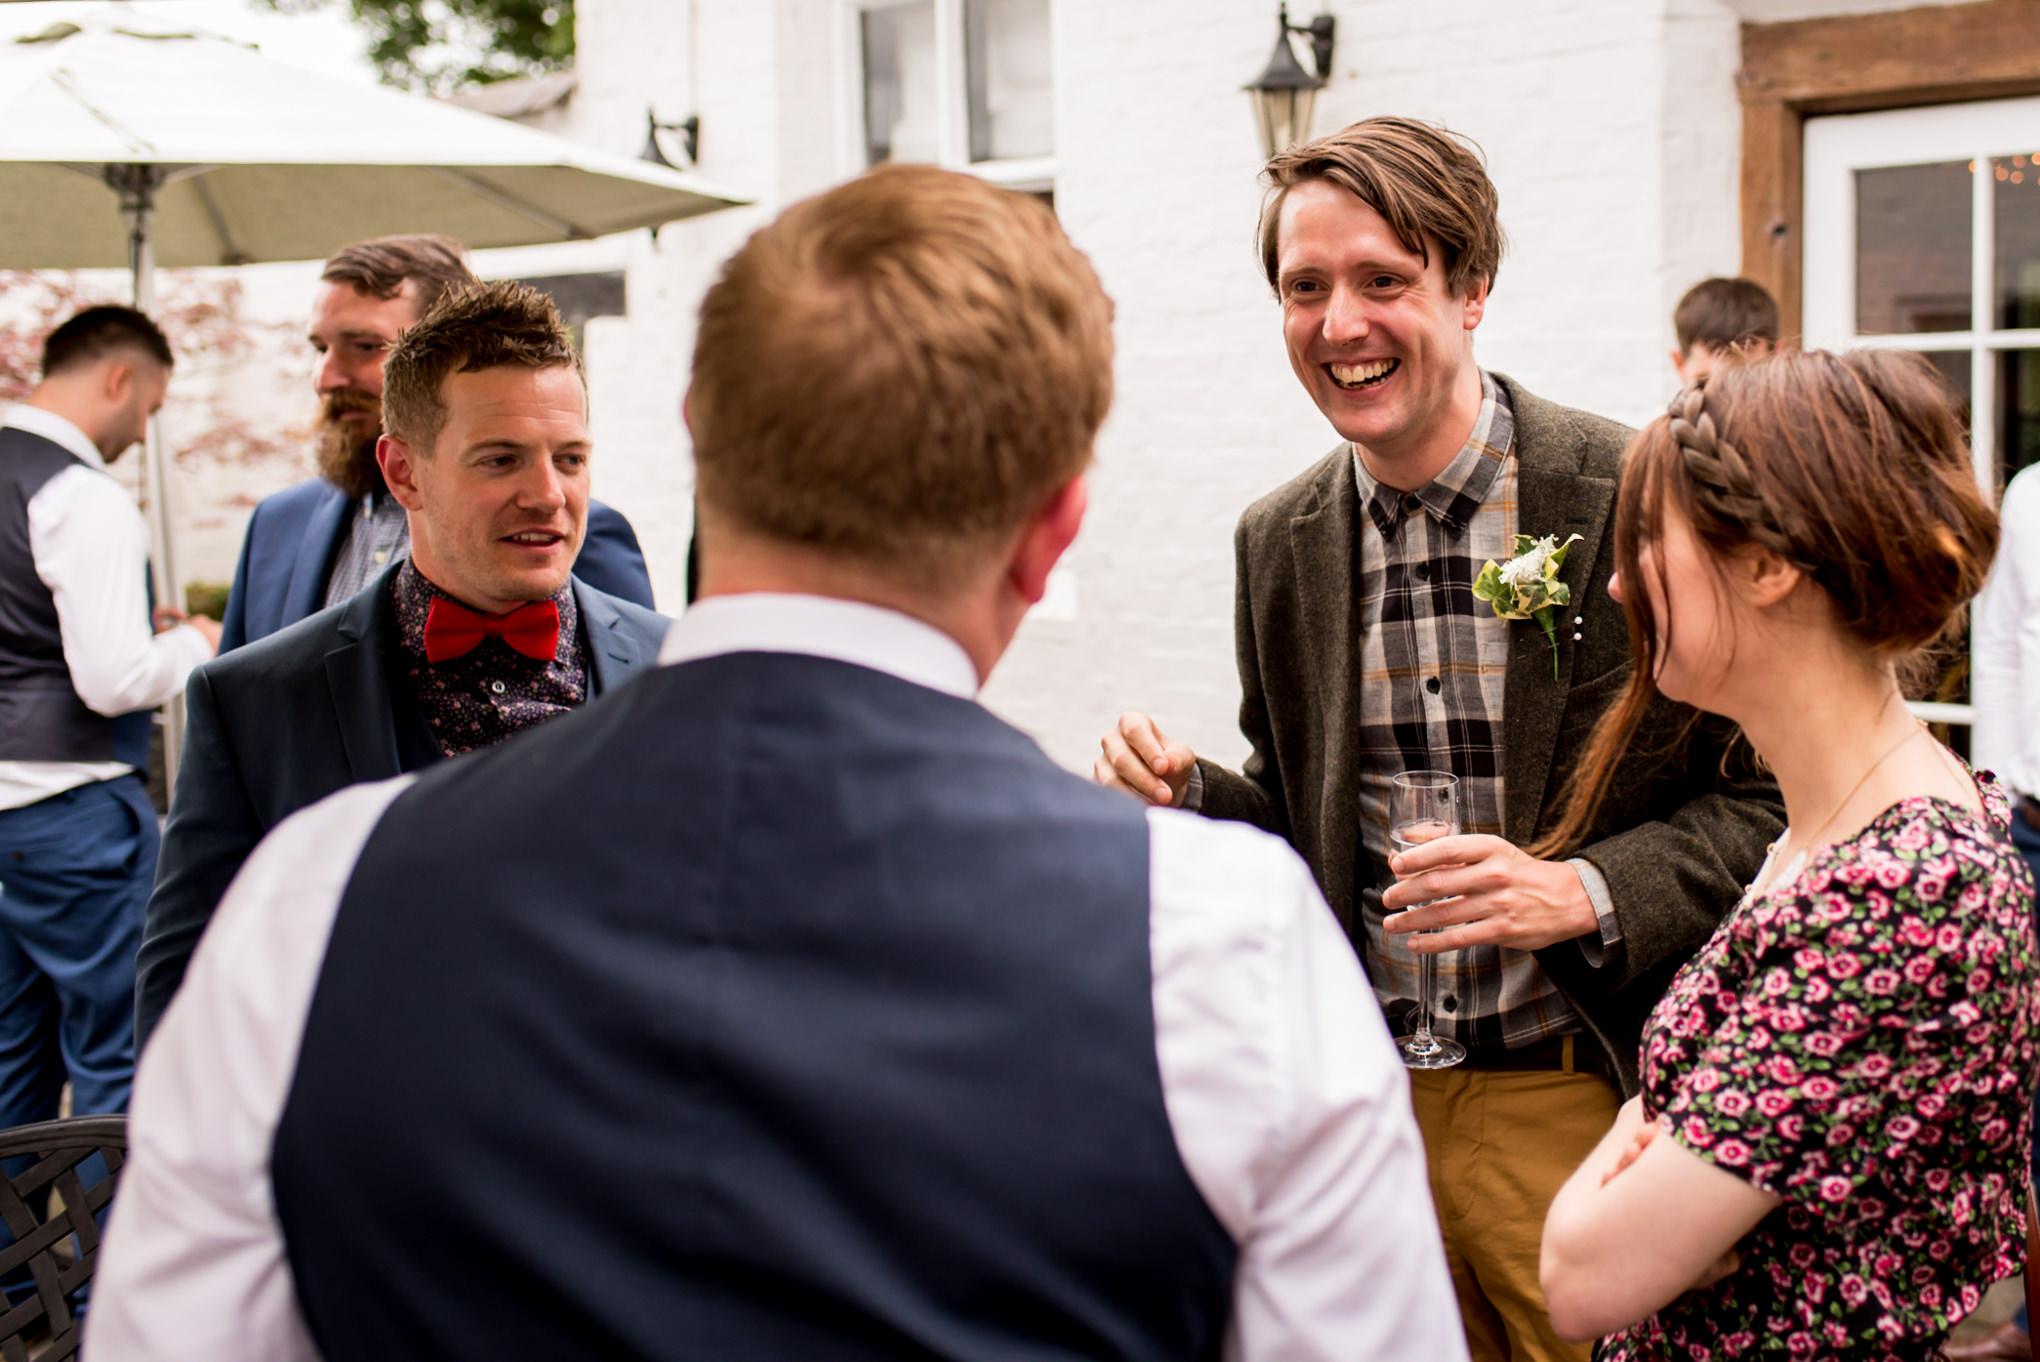 wedding photographer in Warwickshire, Carine Bea – London Wedding Photography – Rachel & Tom